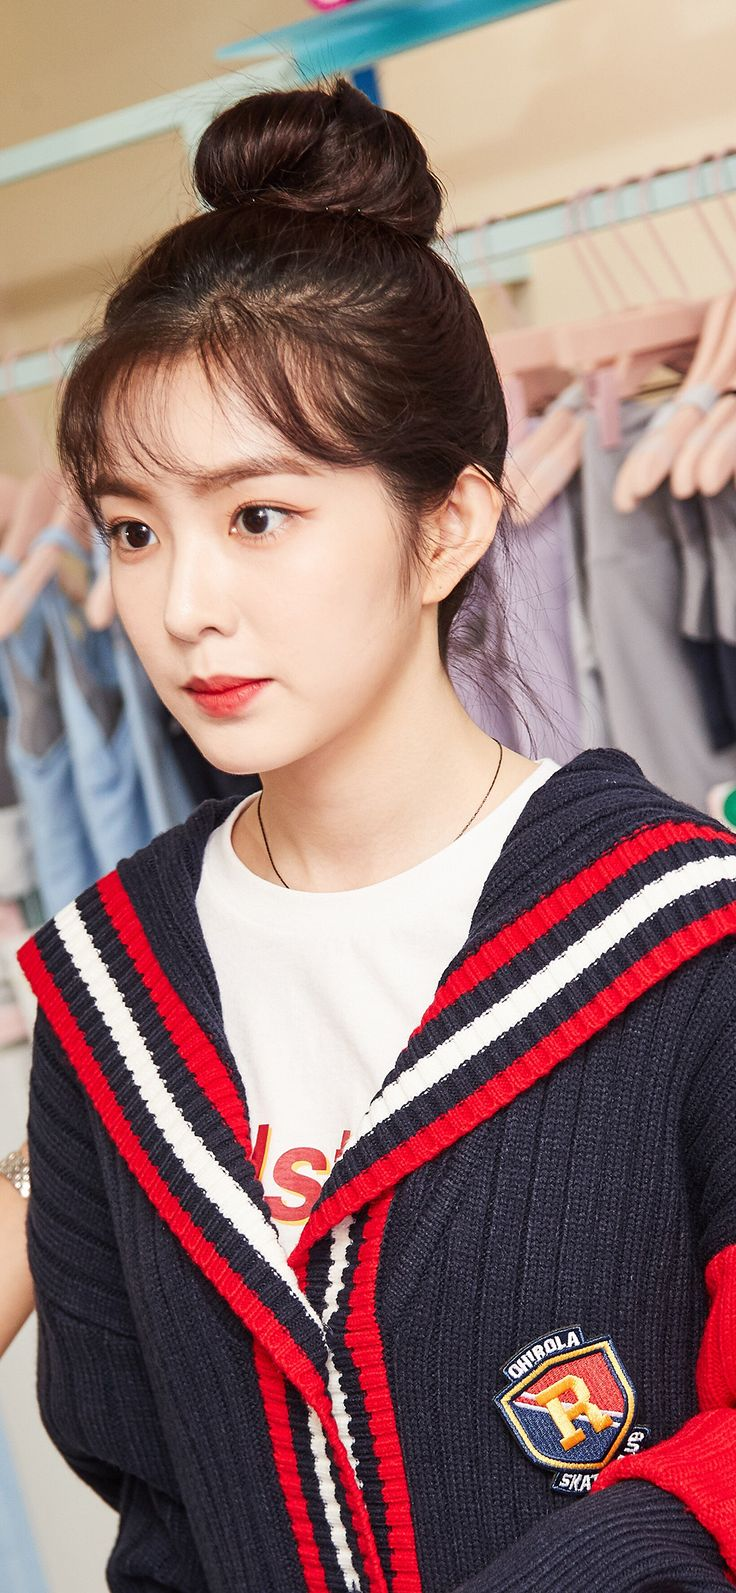 Iphone X Wallpaper Ho80 Girl Cute Kpop Asian Woman Via